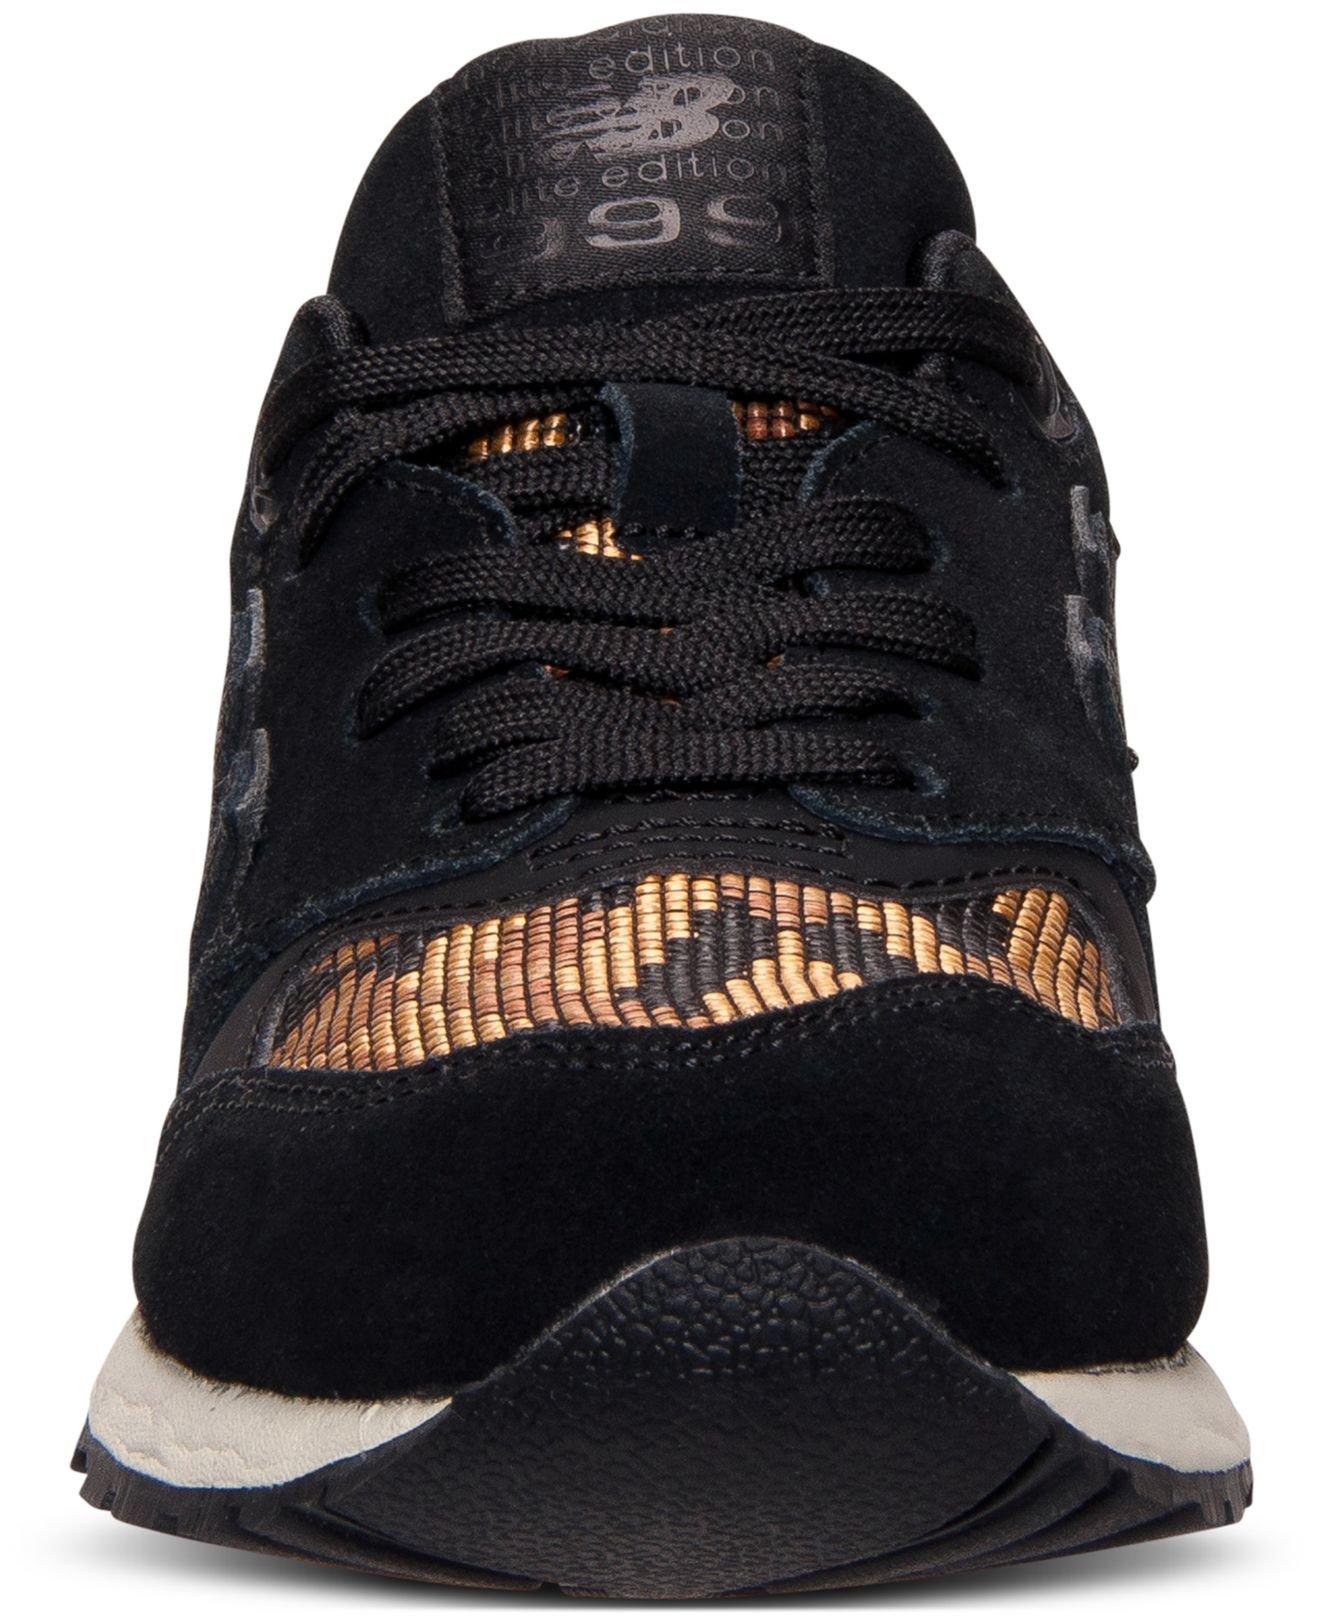 new balance women's 999 sneakers